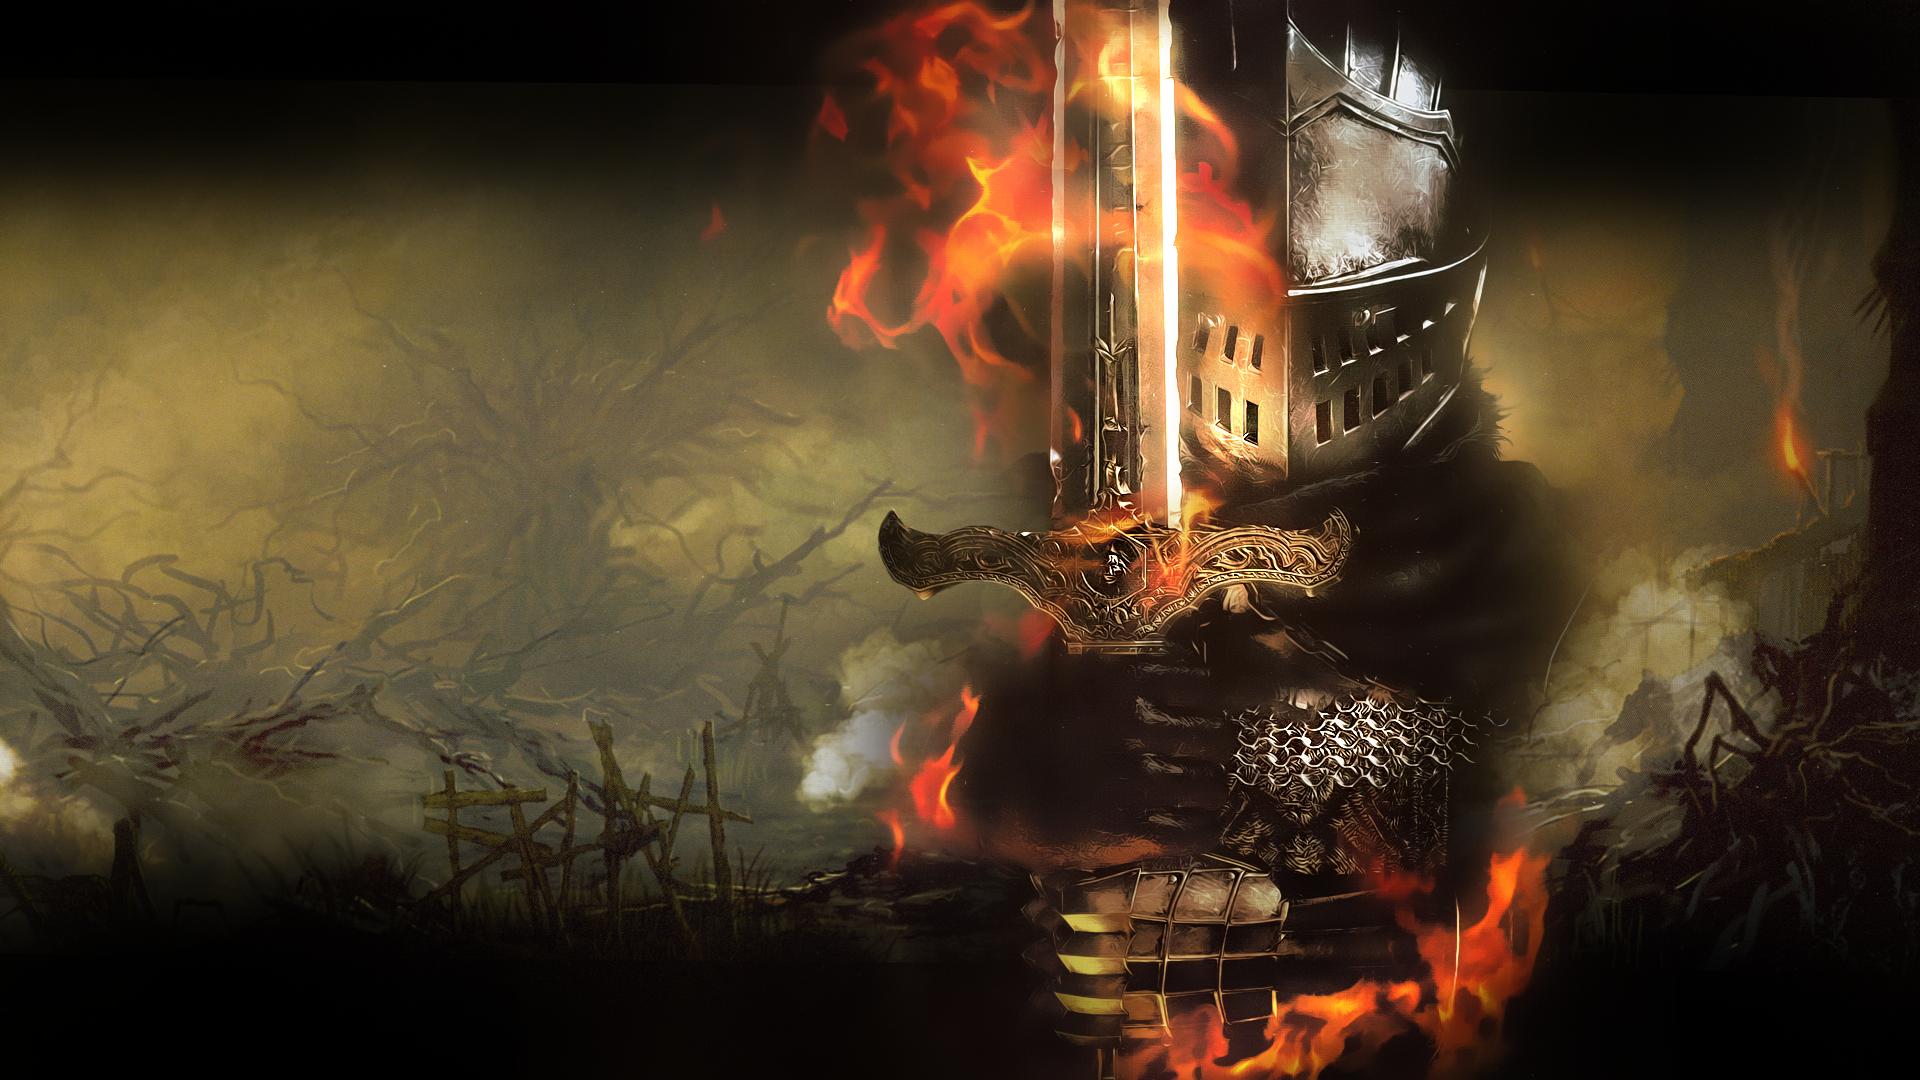 Dark Souls Wallpaper 1080p Is Cool Wallpapers